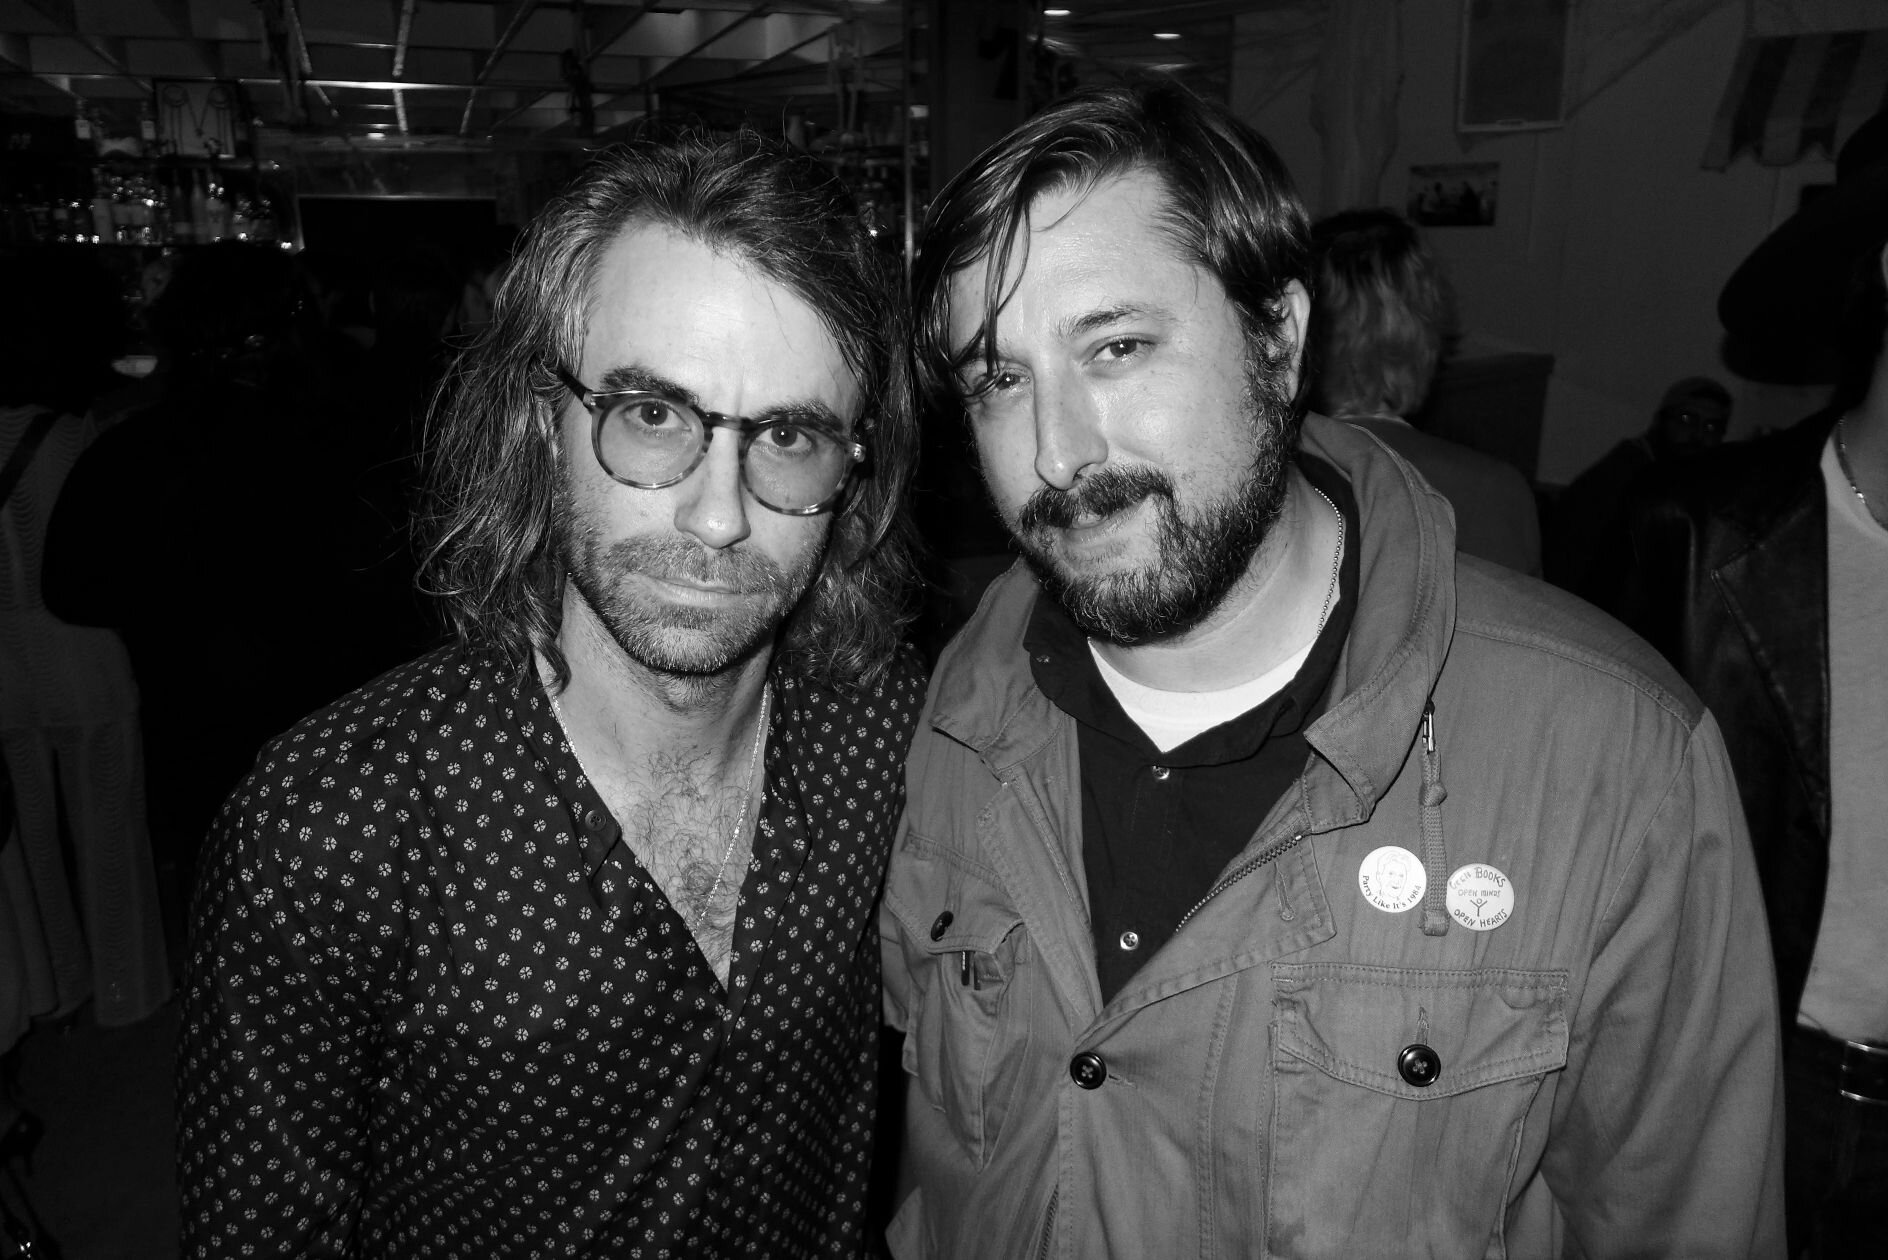 David Black and JC Gabel